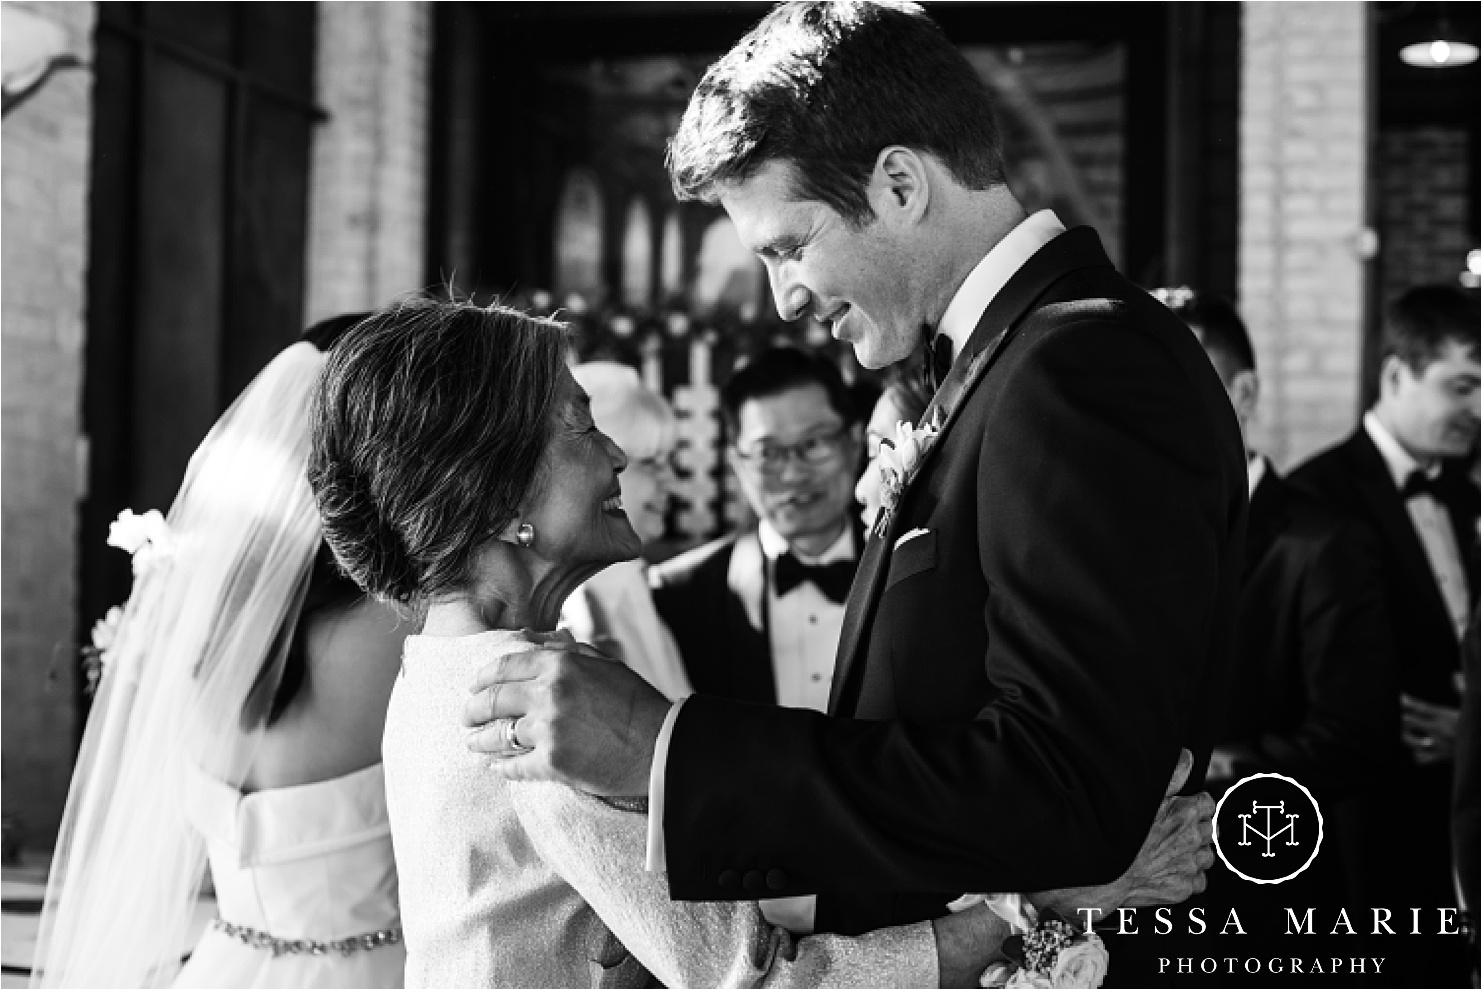 Tessa_marie_weddings_houston_wedding_photographer_The_astorian_0128.jpg